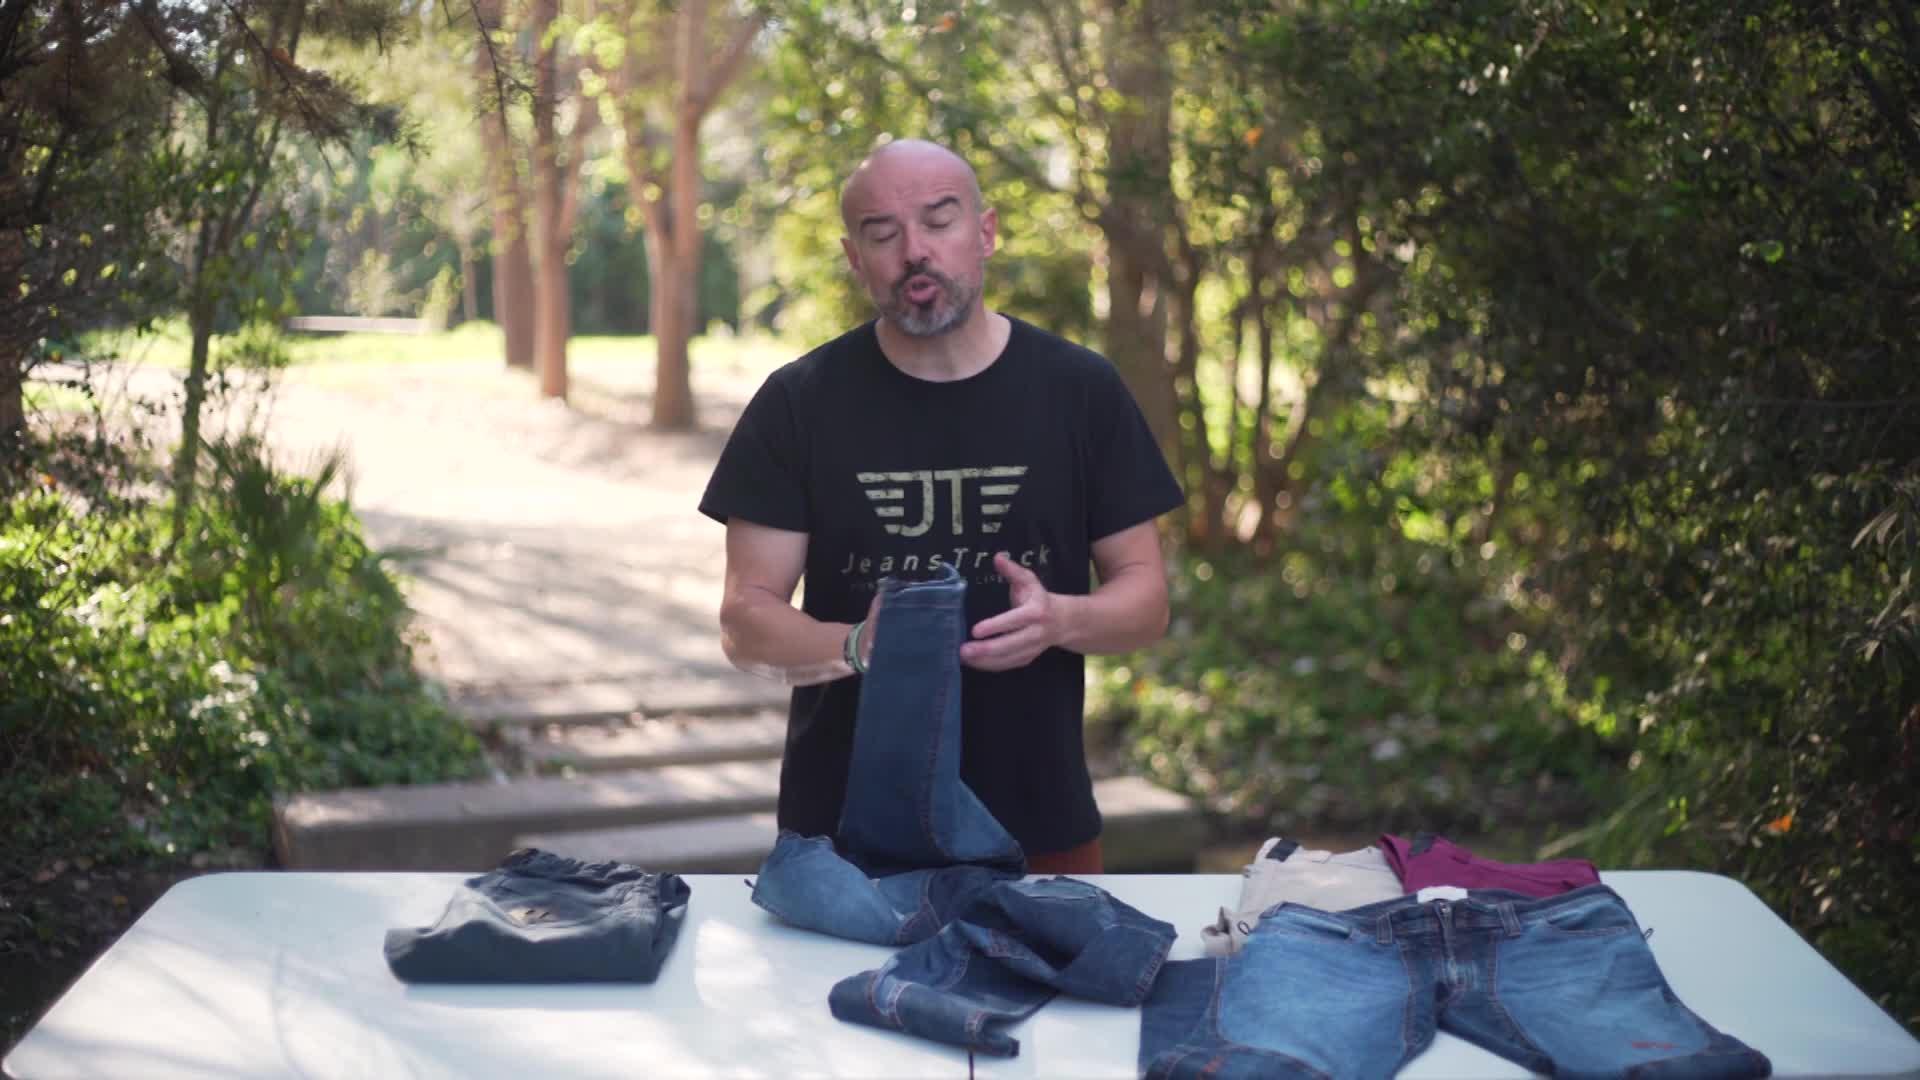 Jeanstrack Tardor Jeans Pantalón de Escalada-Trekking, Mujer